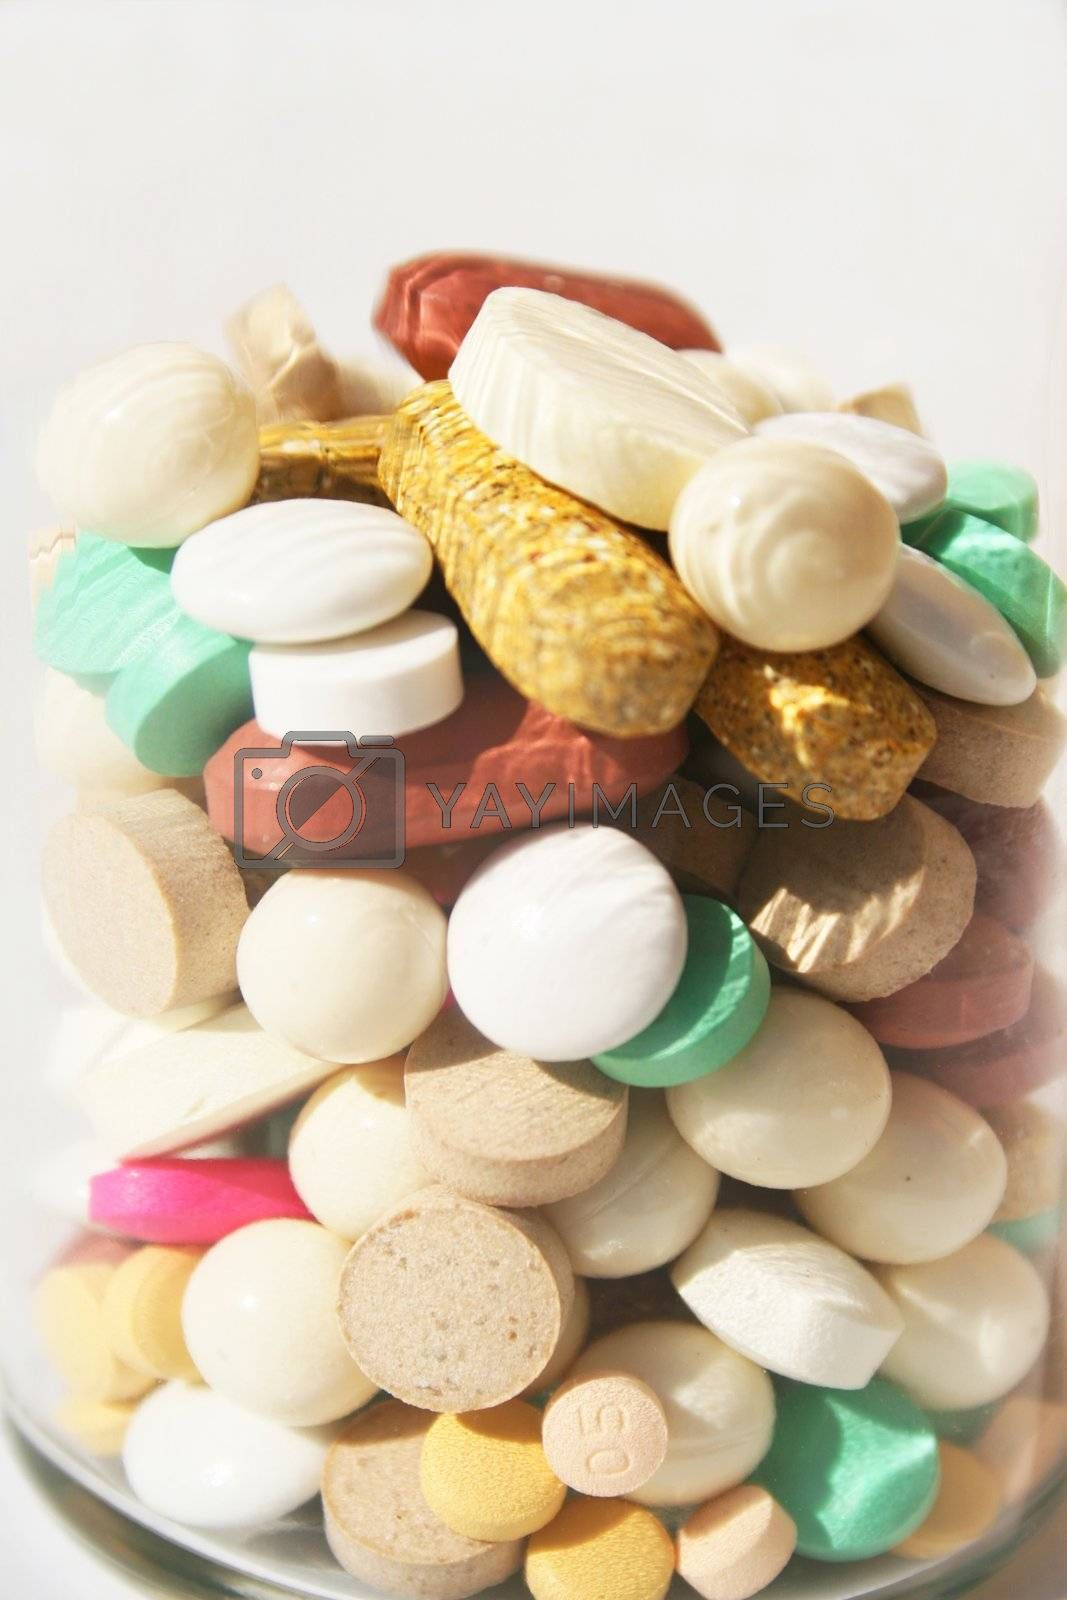 Bottle of various pills close-up